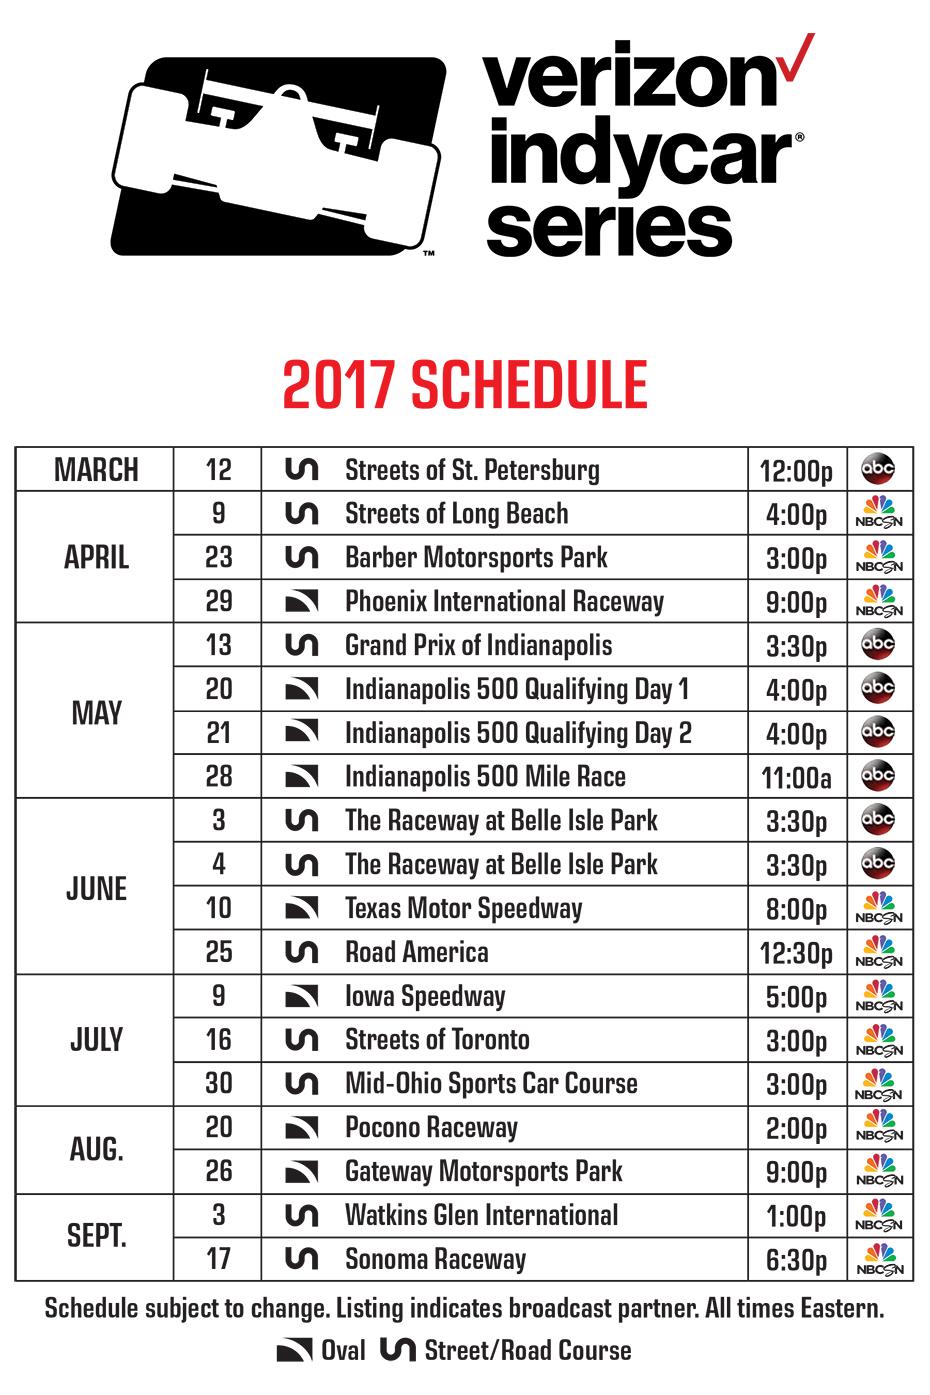 2017 Verizon IndyCar Series Television Broadcast Schedule